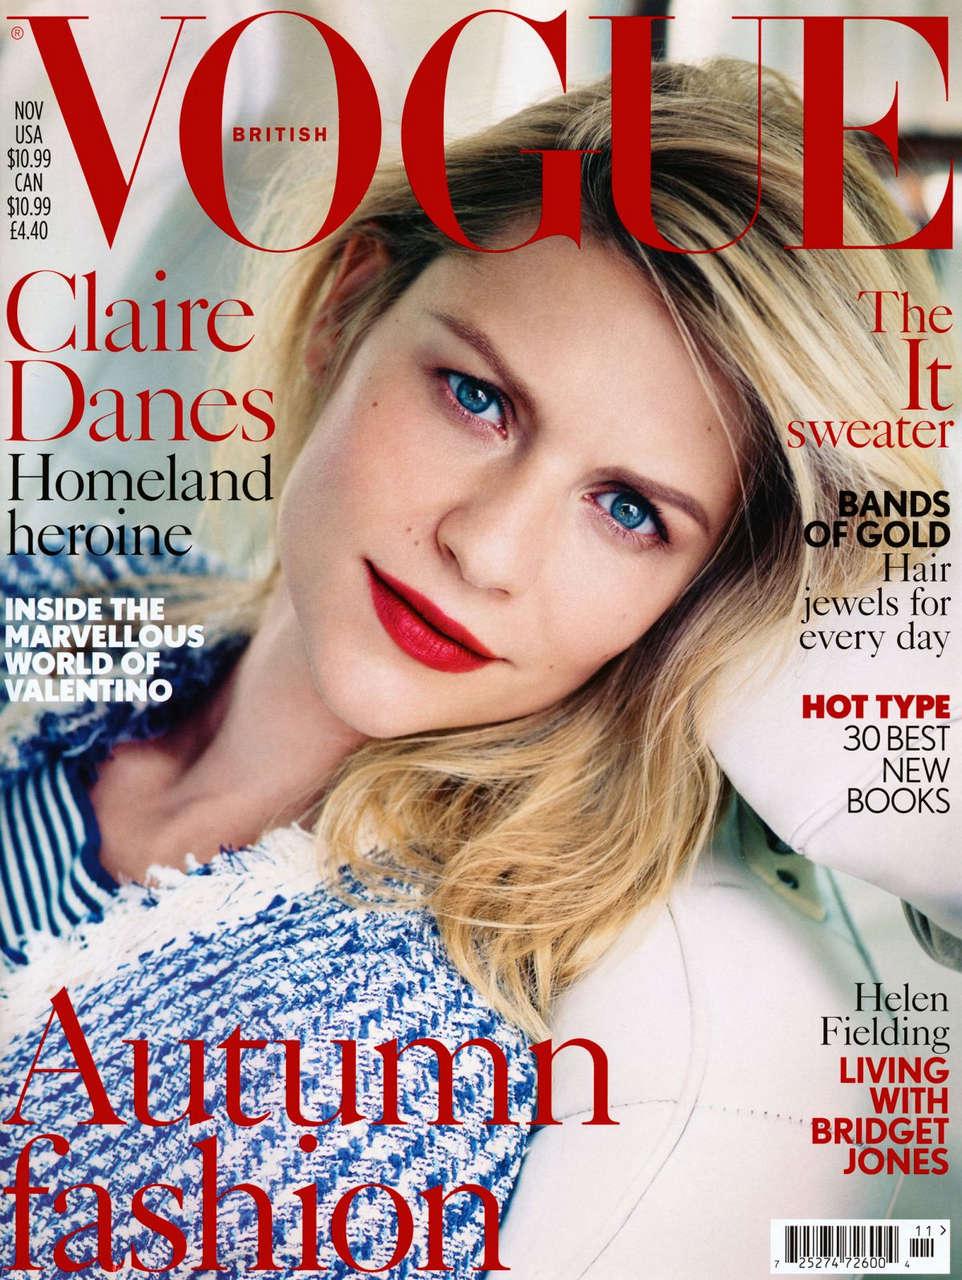 Claire Danes Vogue Magazine Uk November 2013 Issue